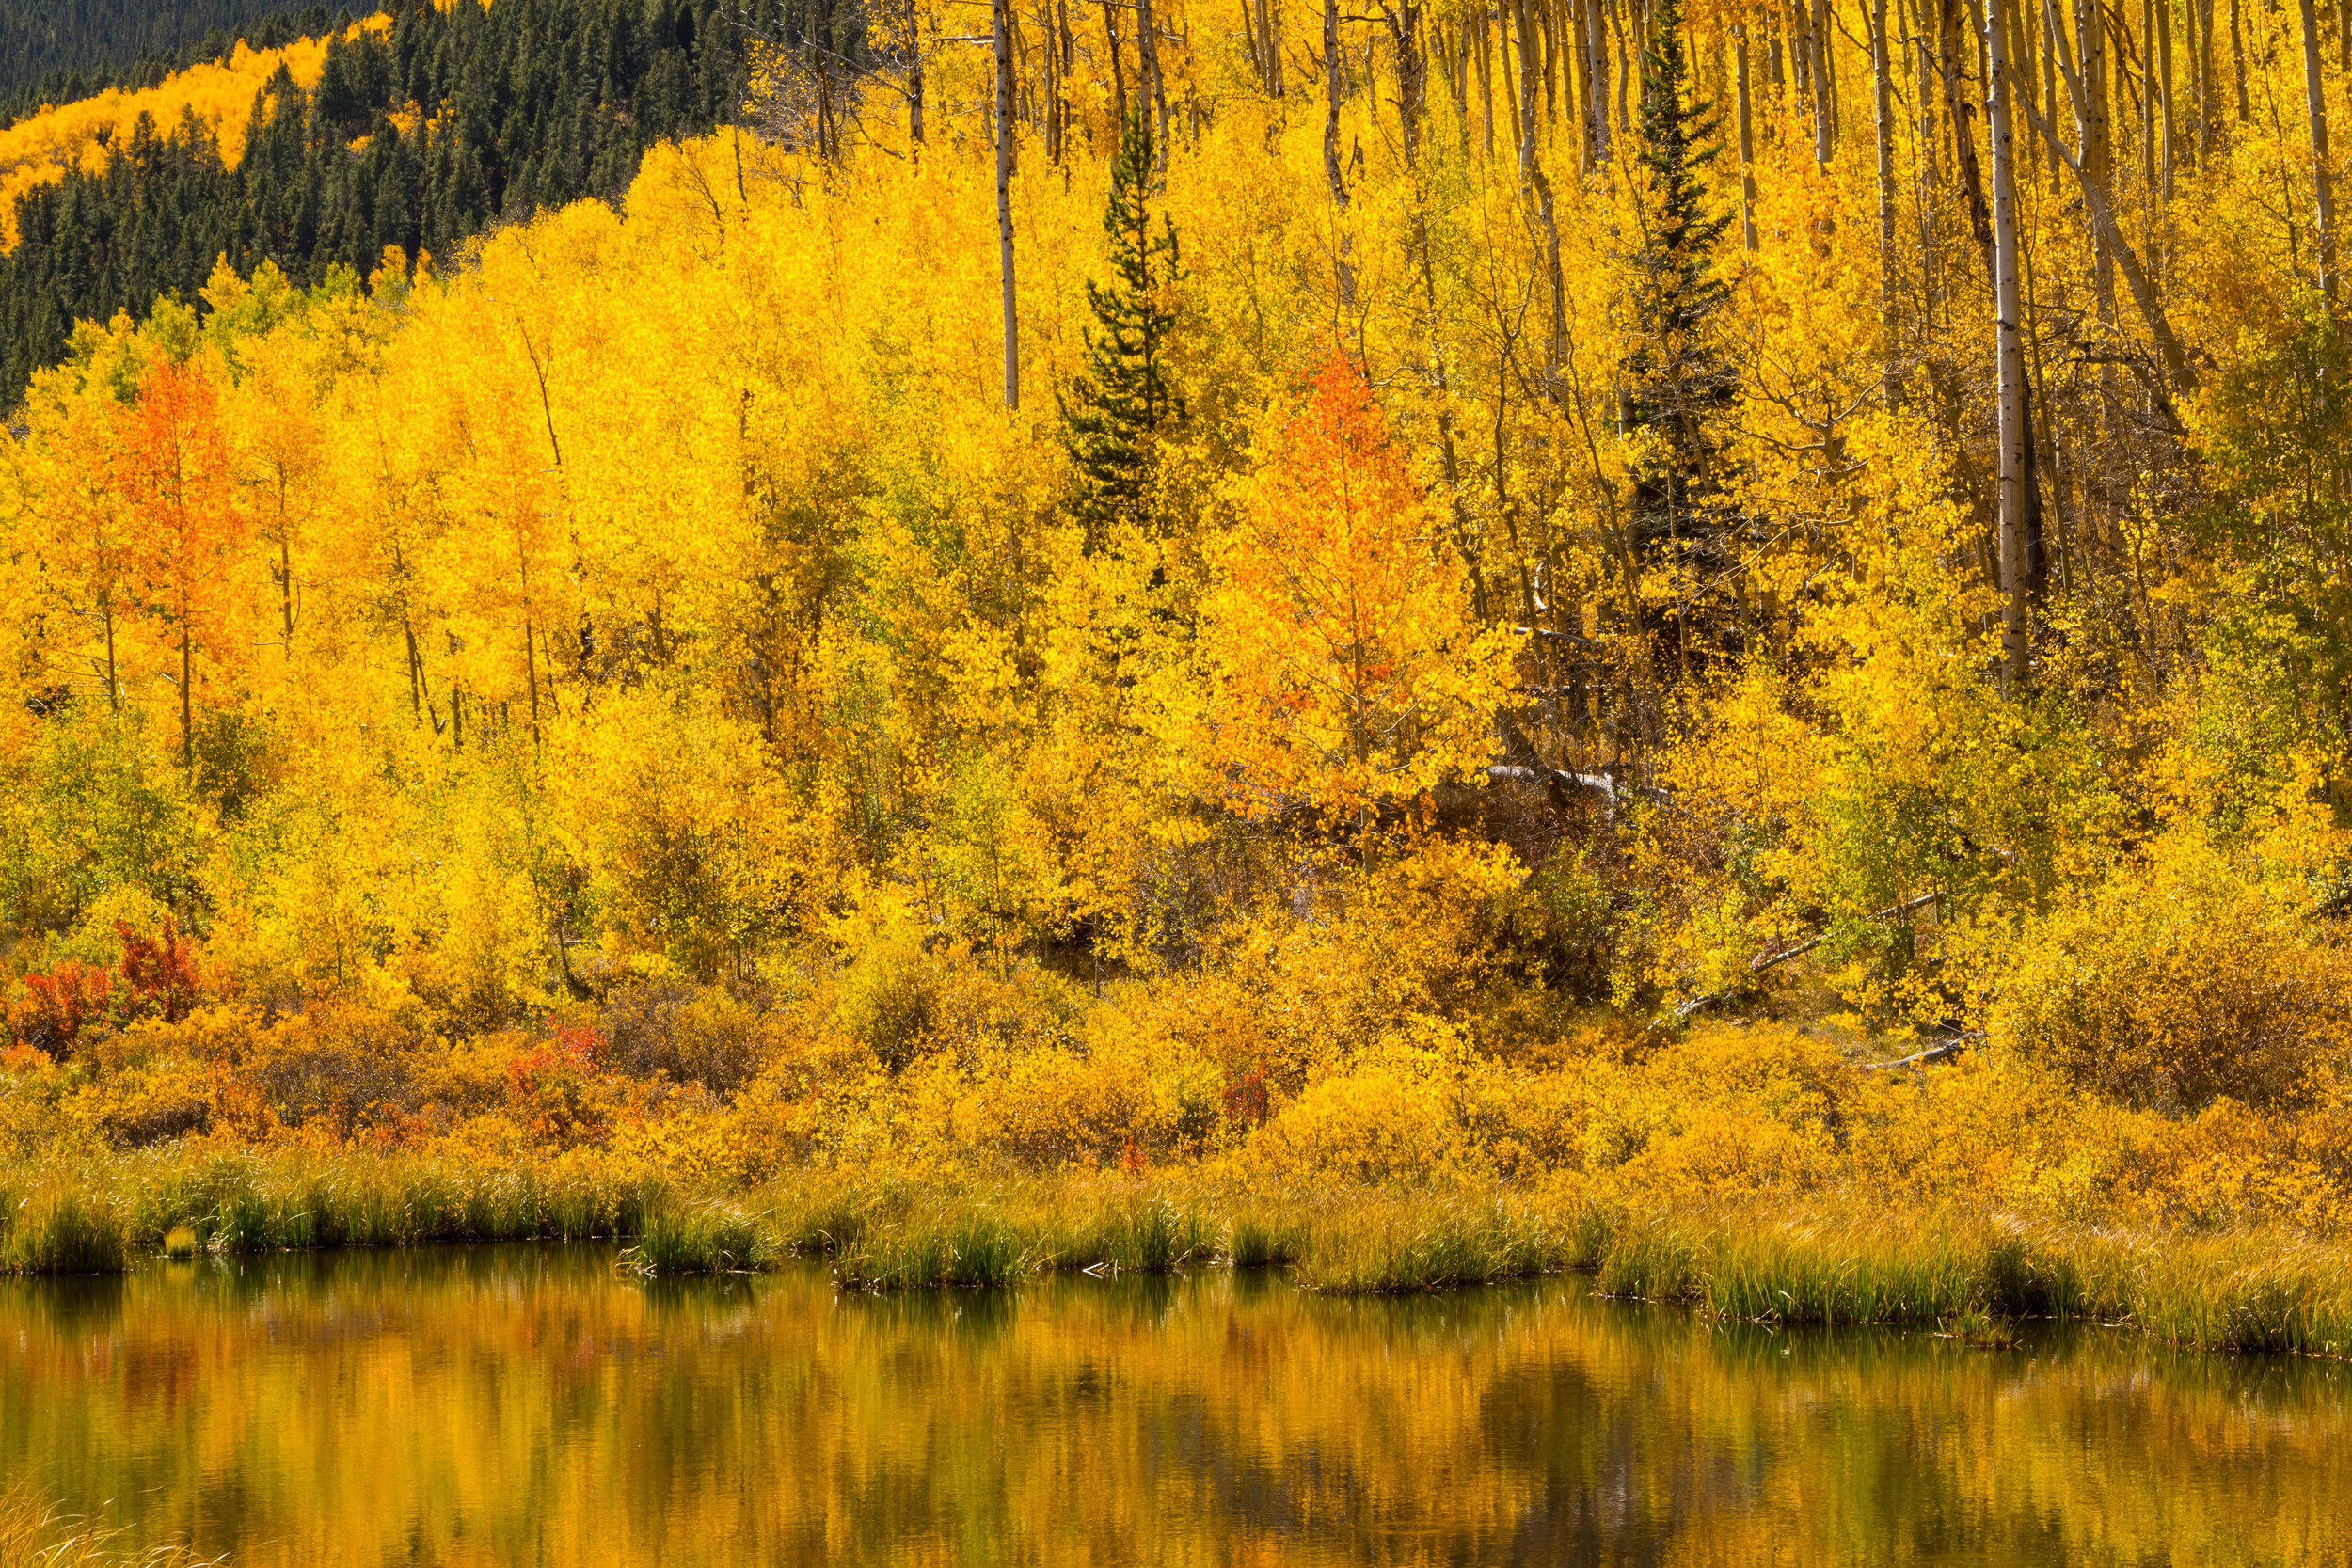 Twin Lakes, Image # 1033